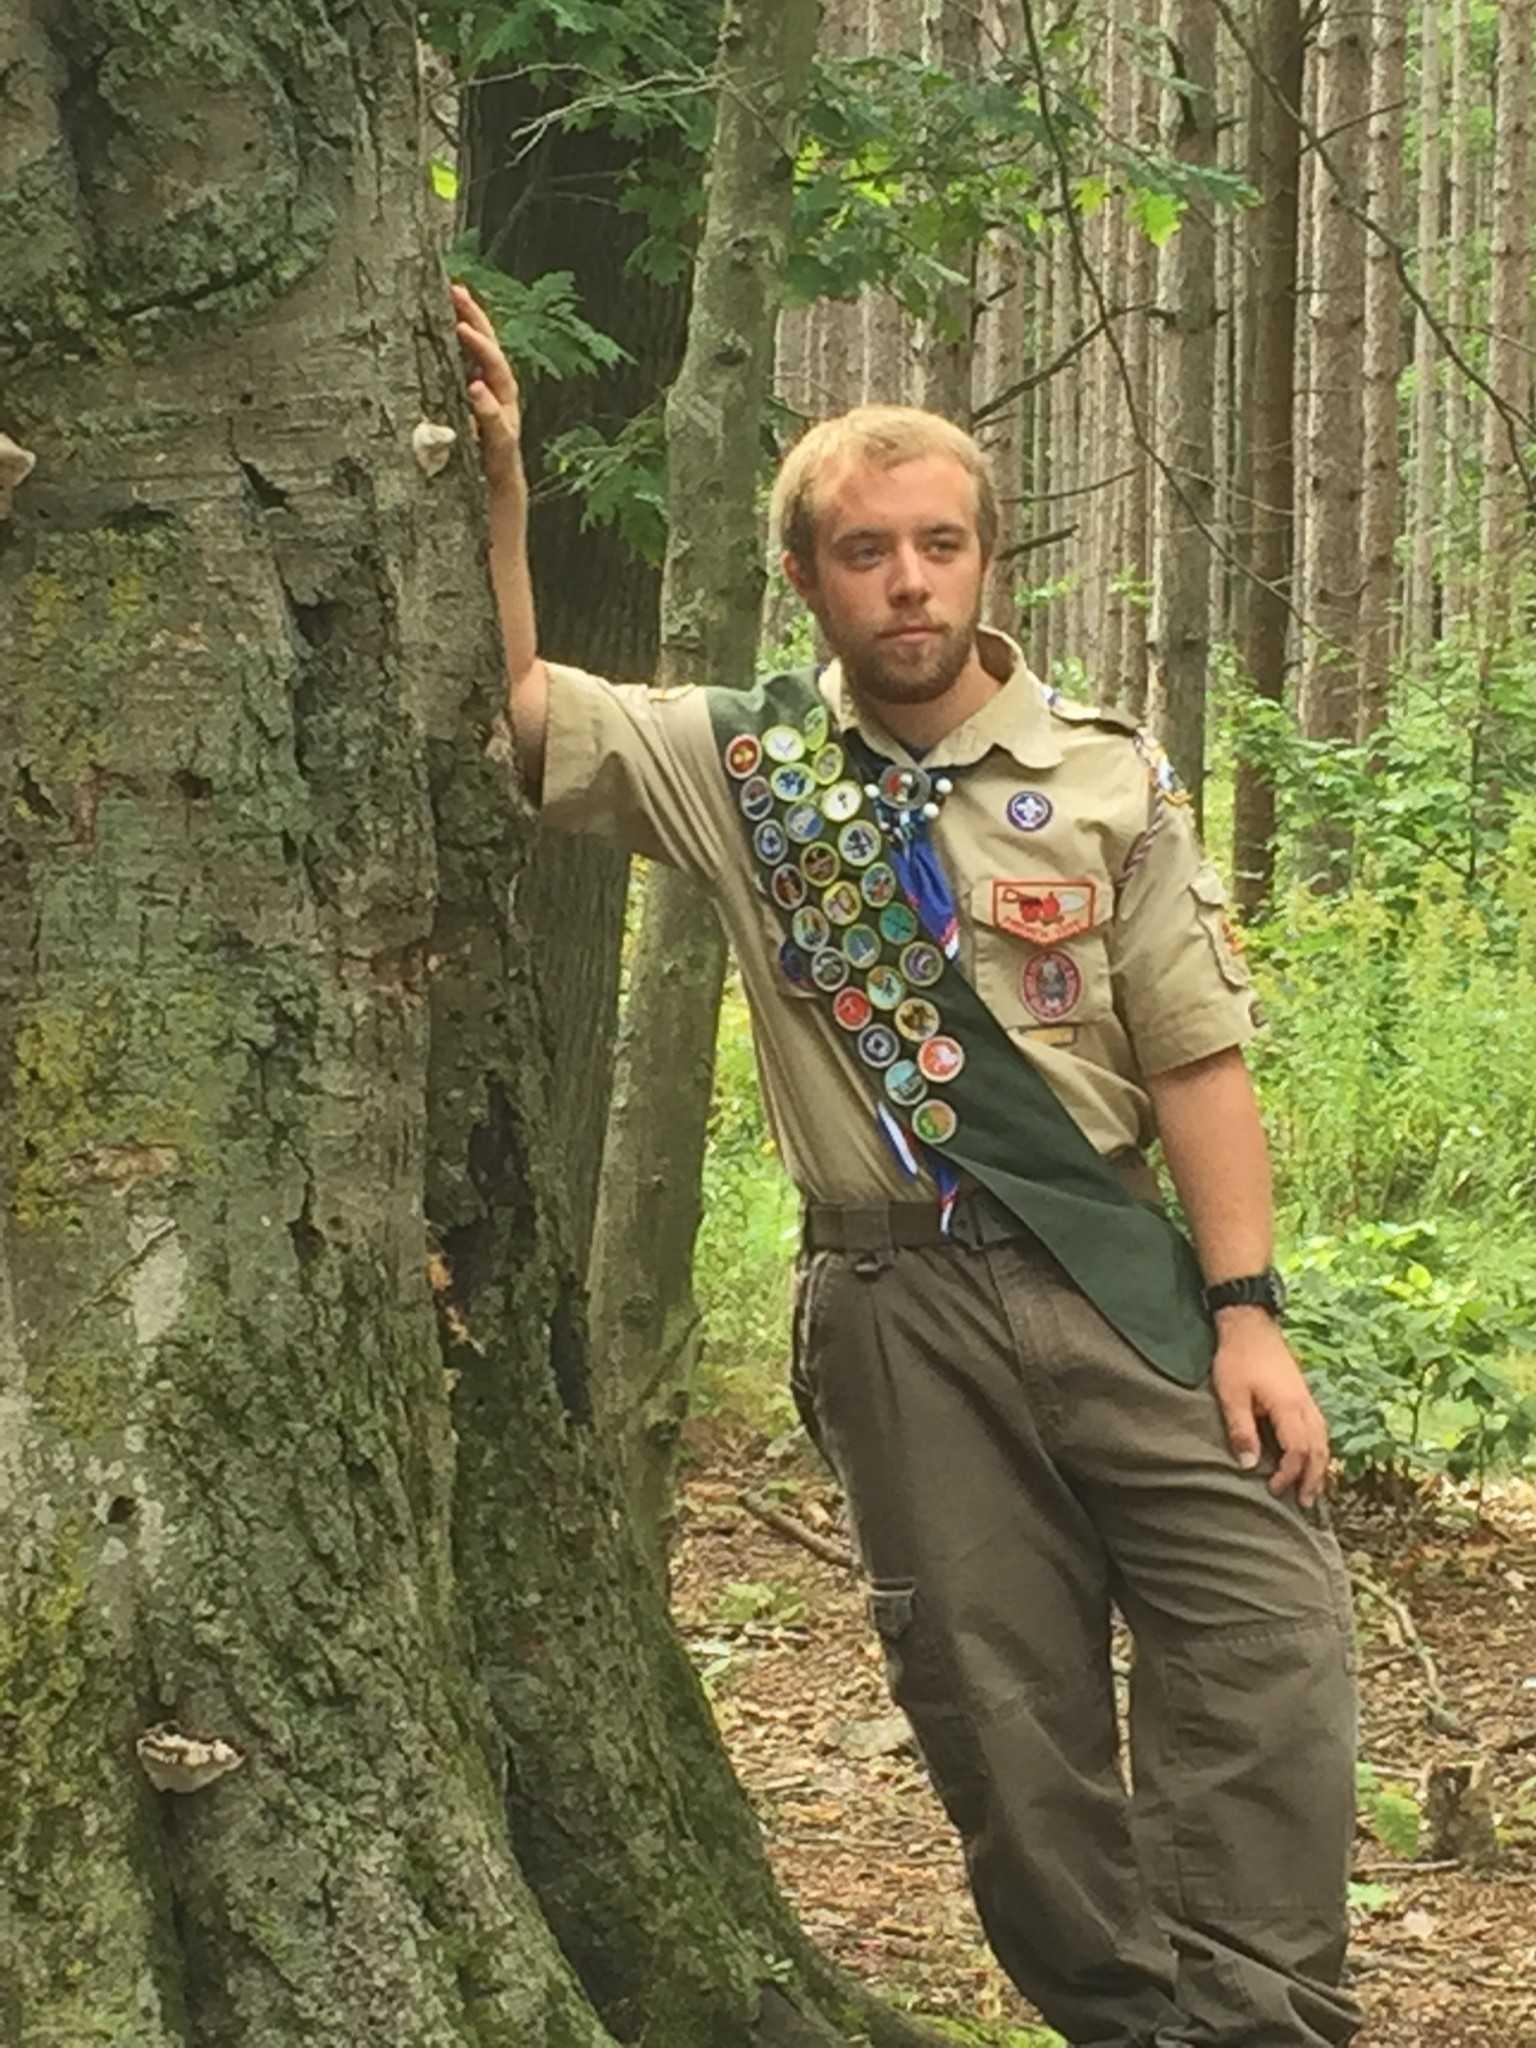 Eagle Scout Karl Heindlmeyer